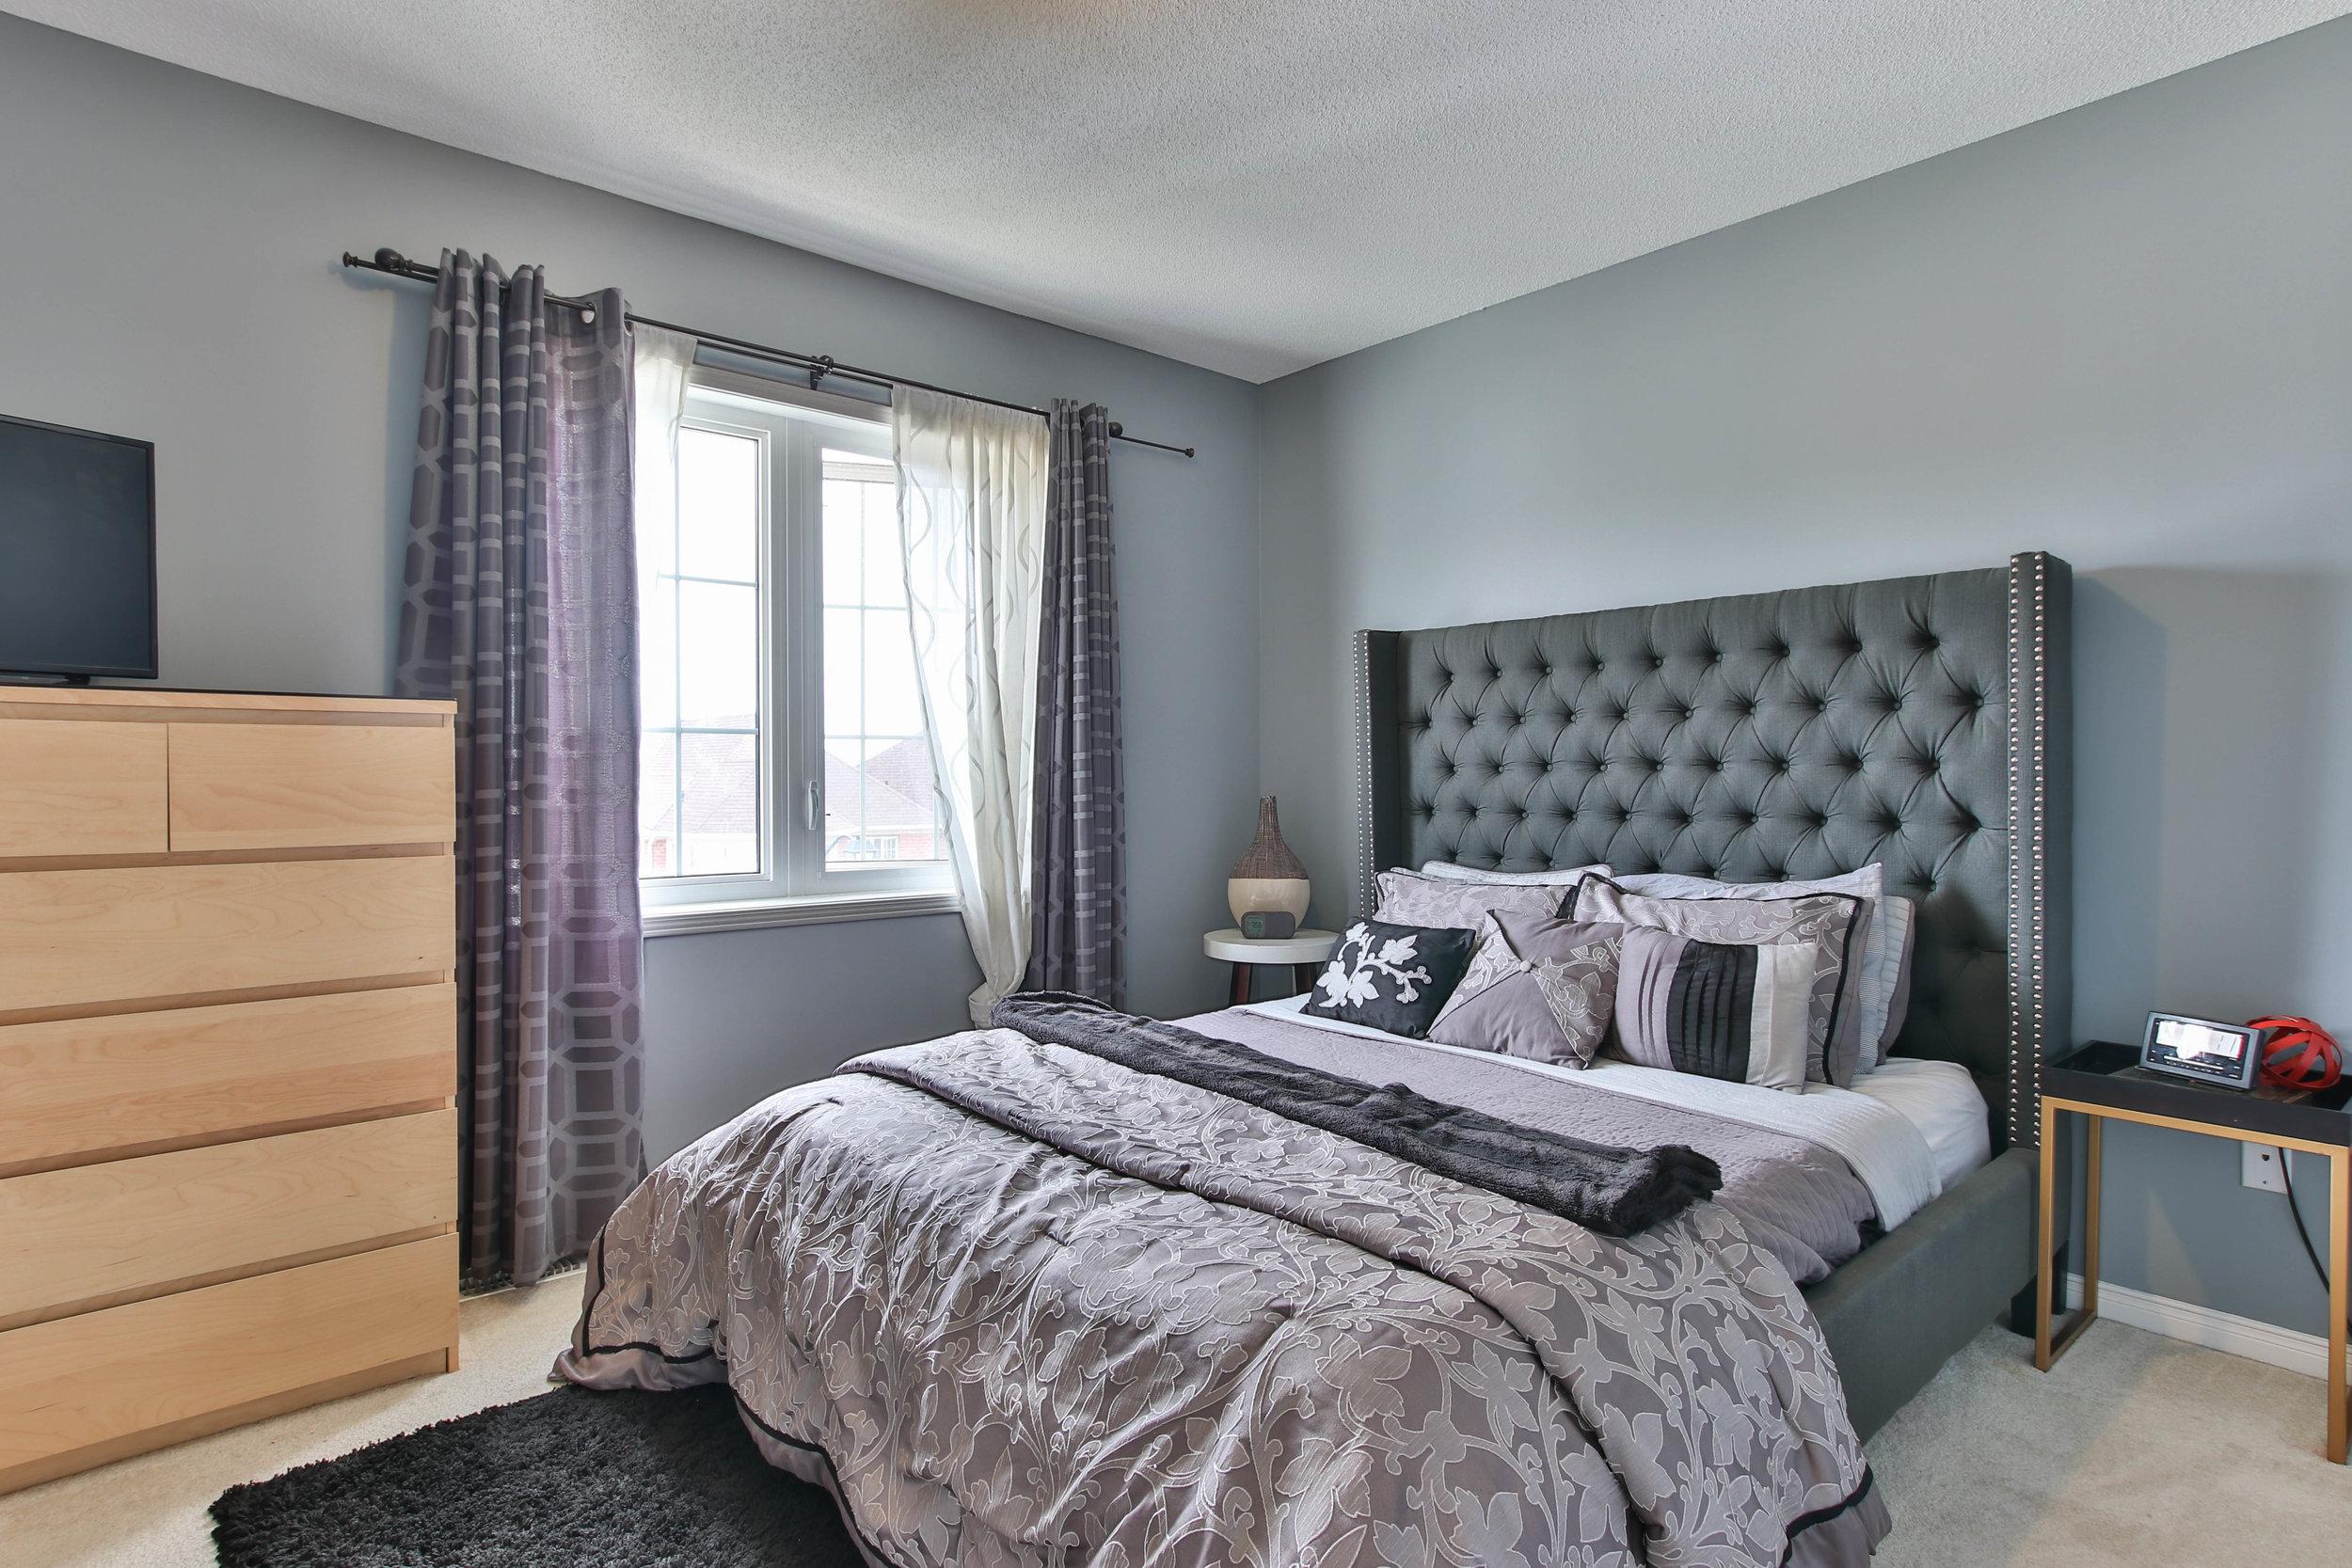 19_Bedroom (1 of 1).jpg